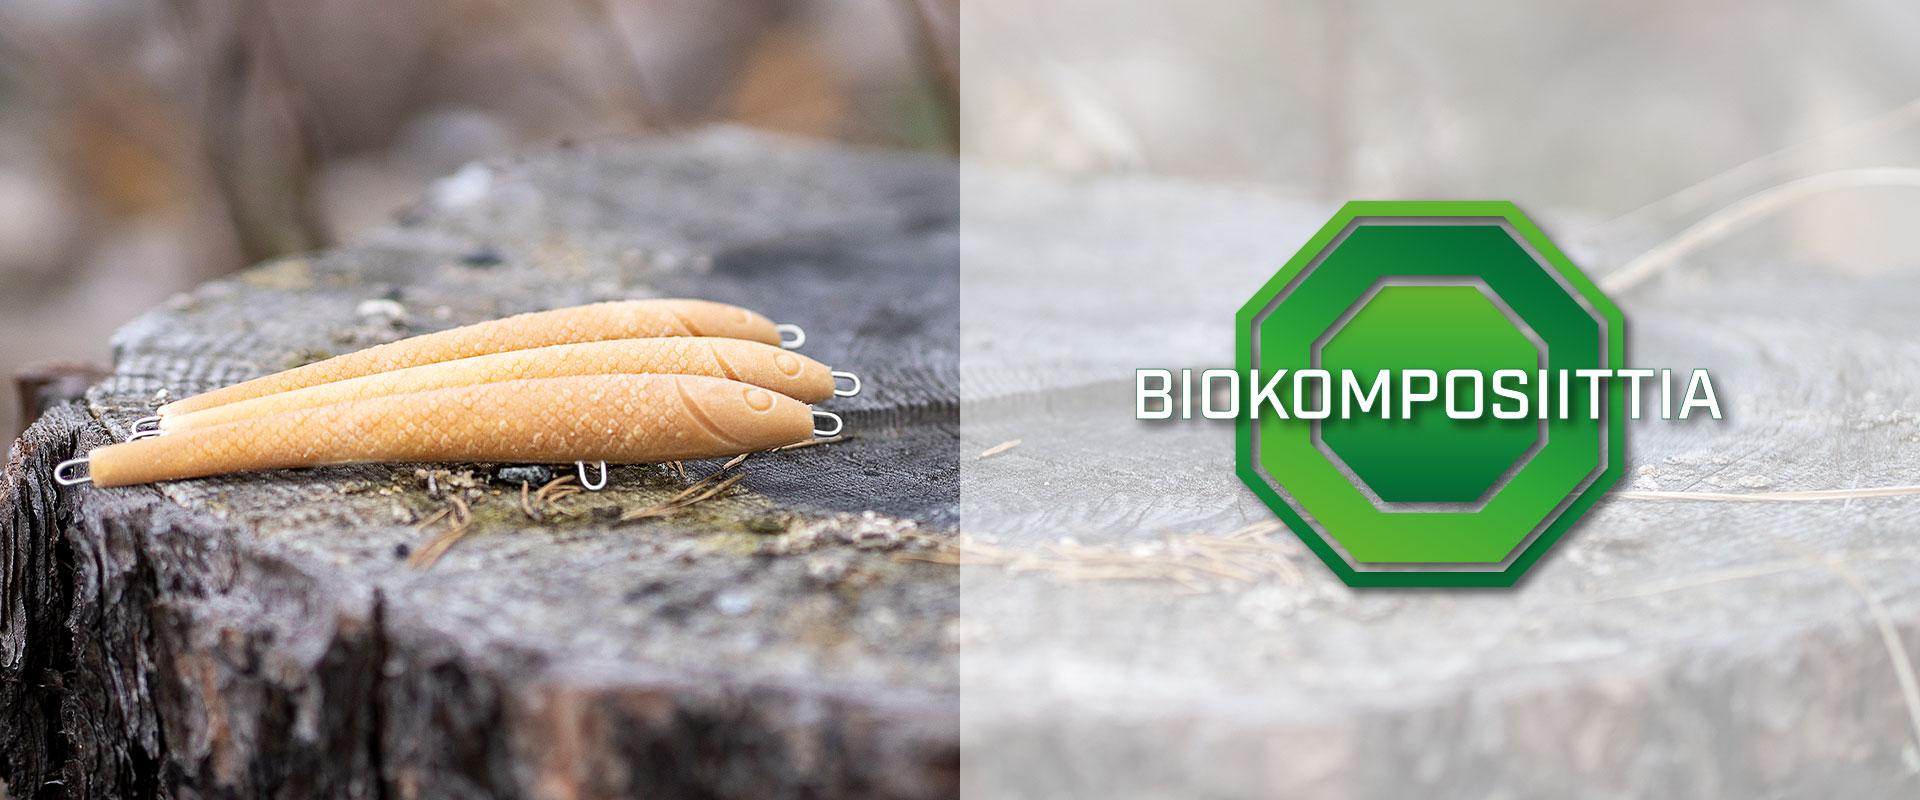 Purhu vaaput biokomposiitista